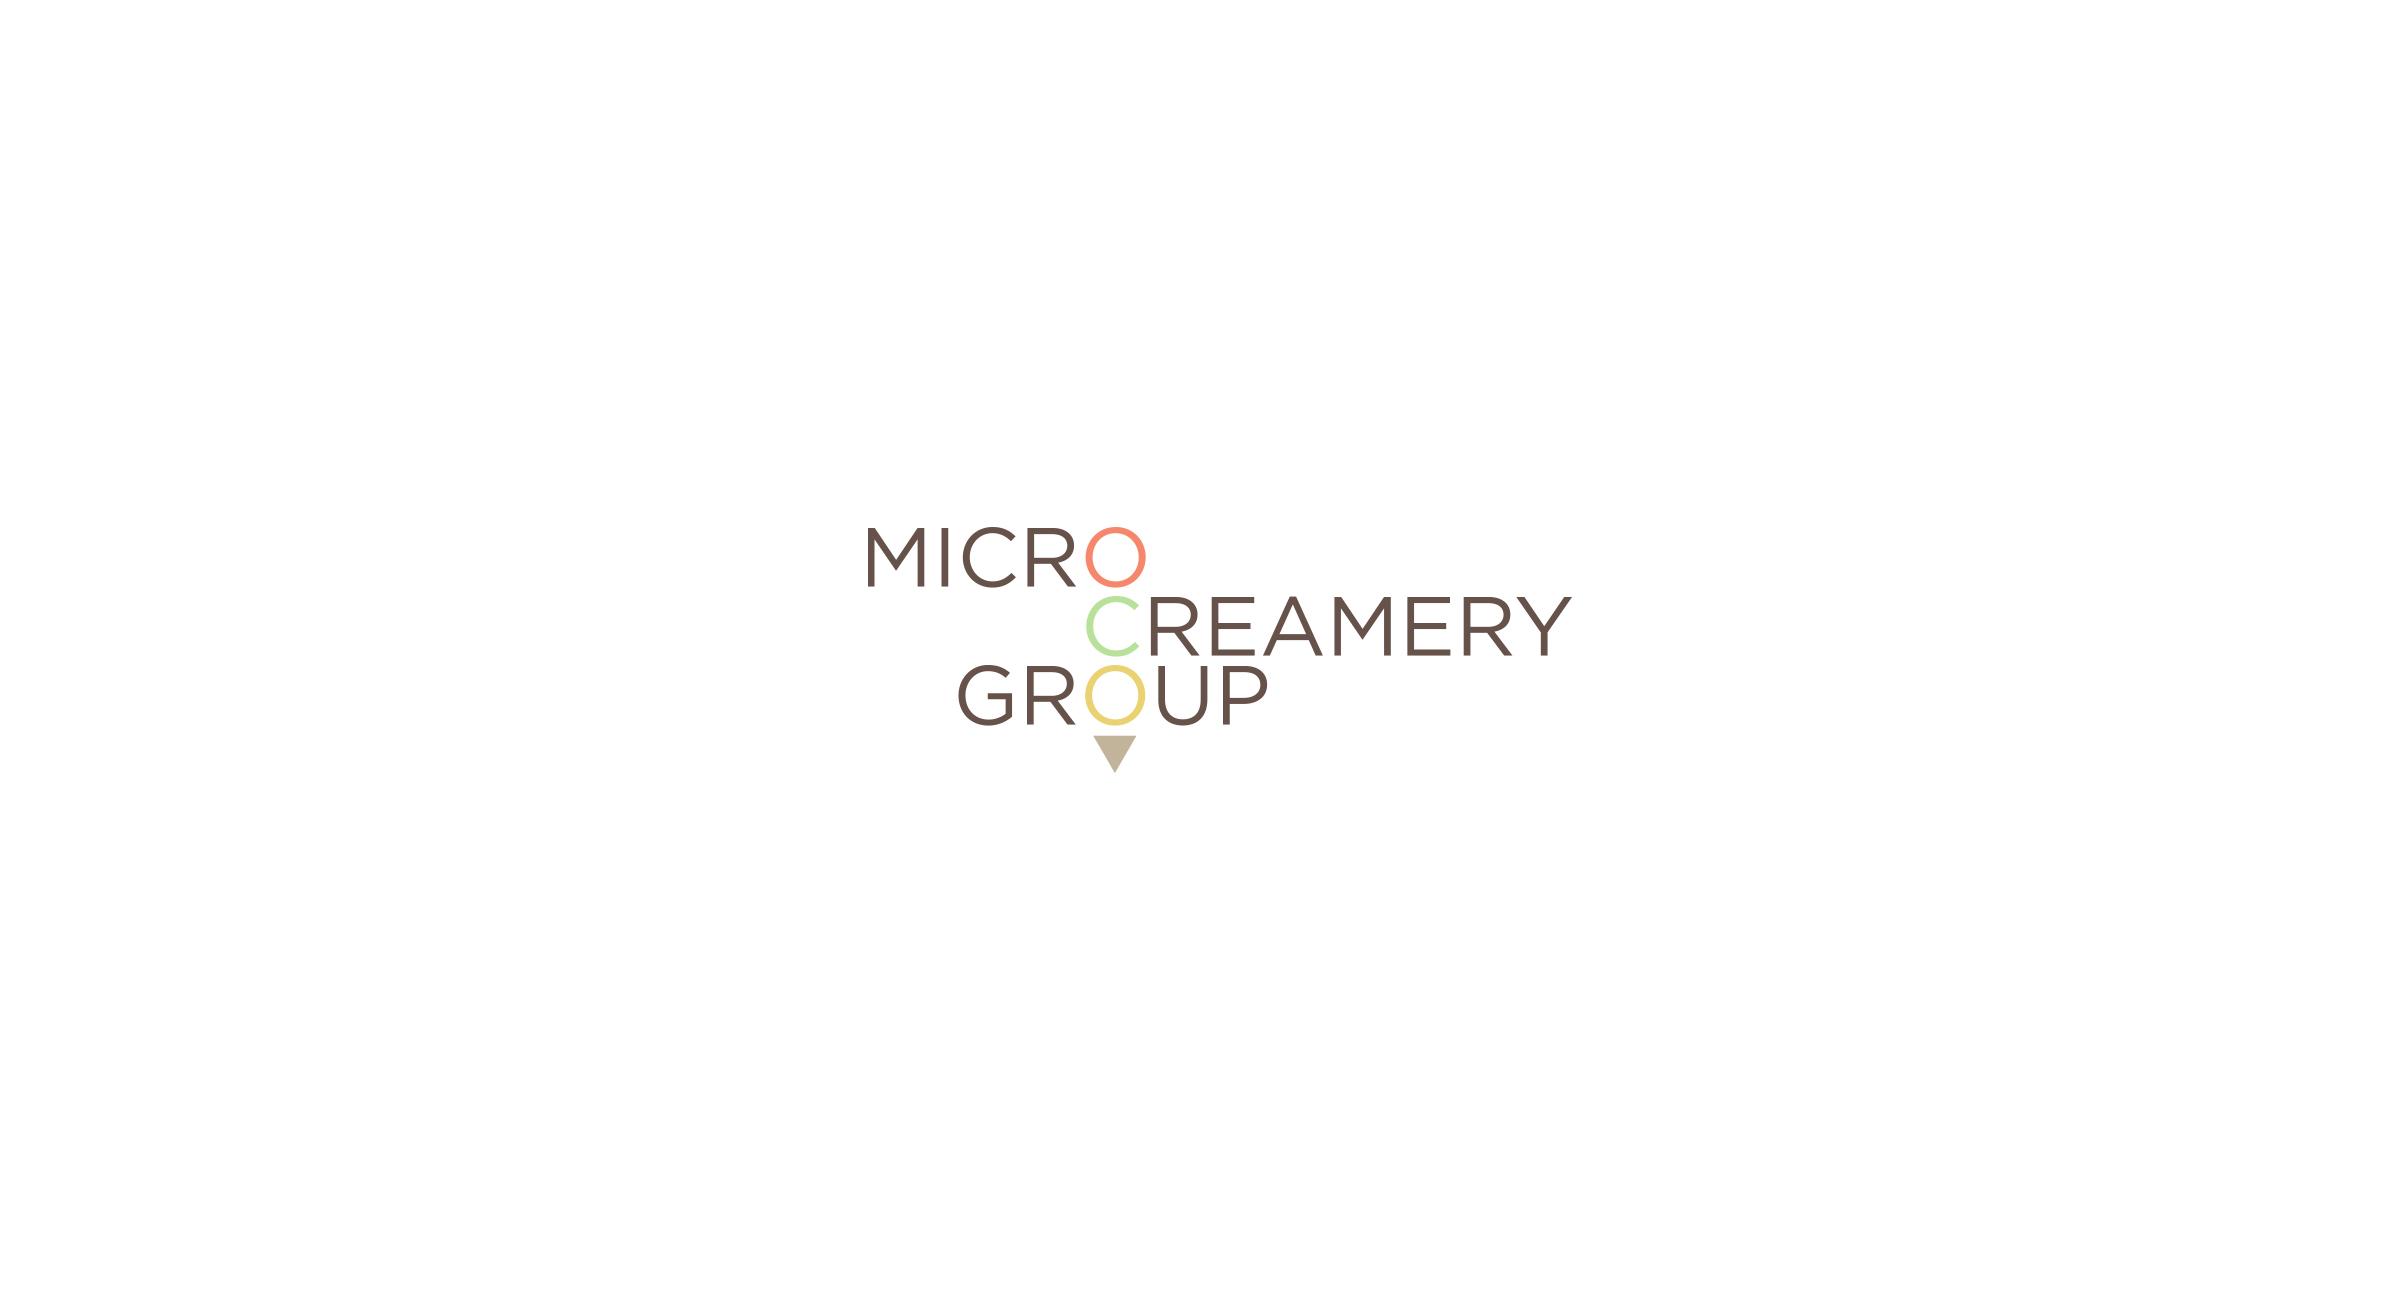 Logo_Branding_Microcreamery_McQuade_Design.jpg